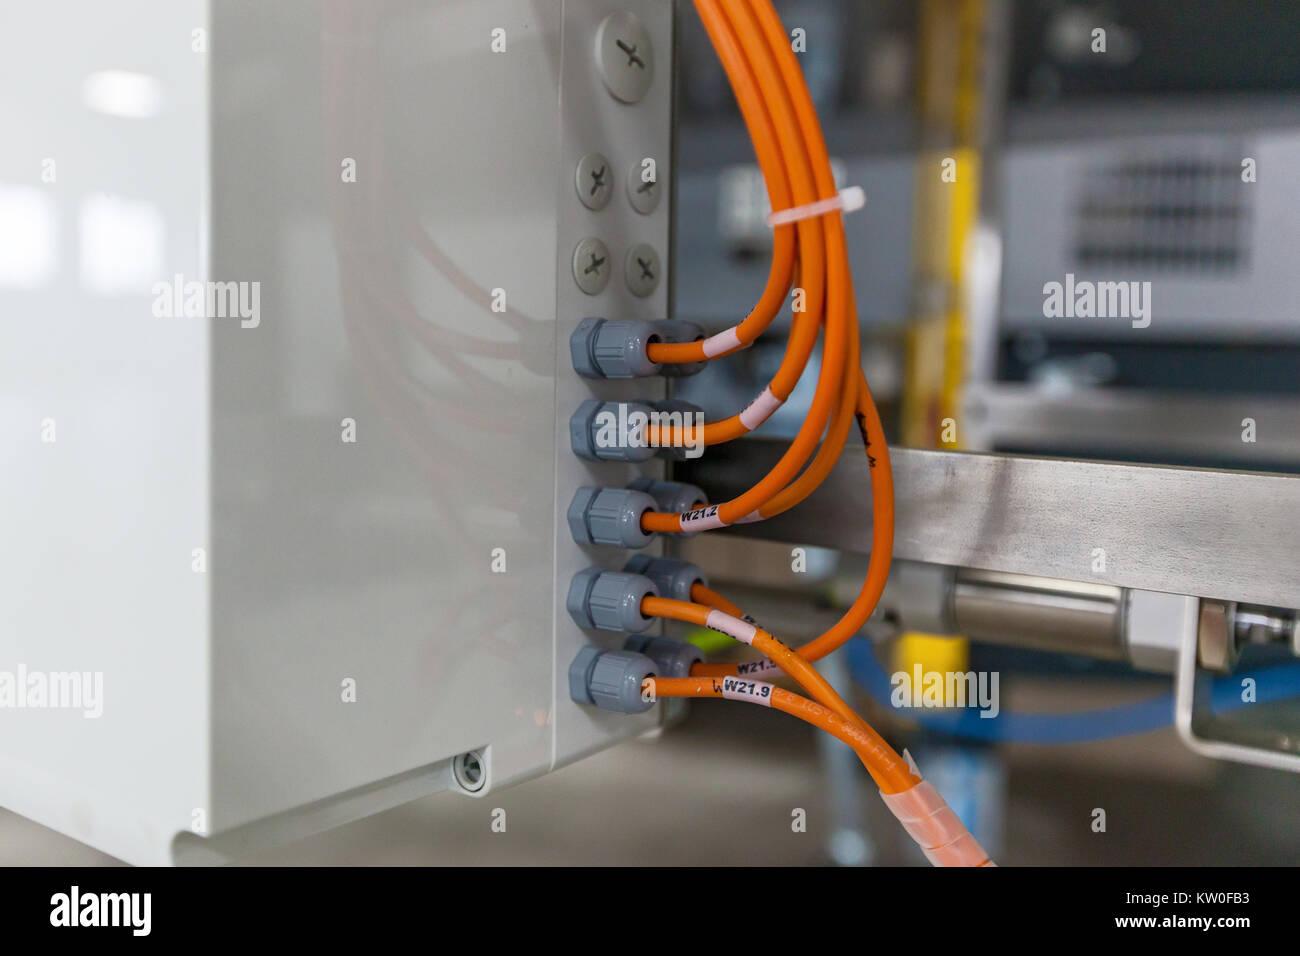 Old Electrical Box Stockfotos & Old Electrical Box Bilder - Alamy